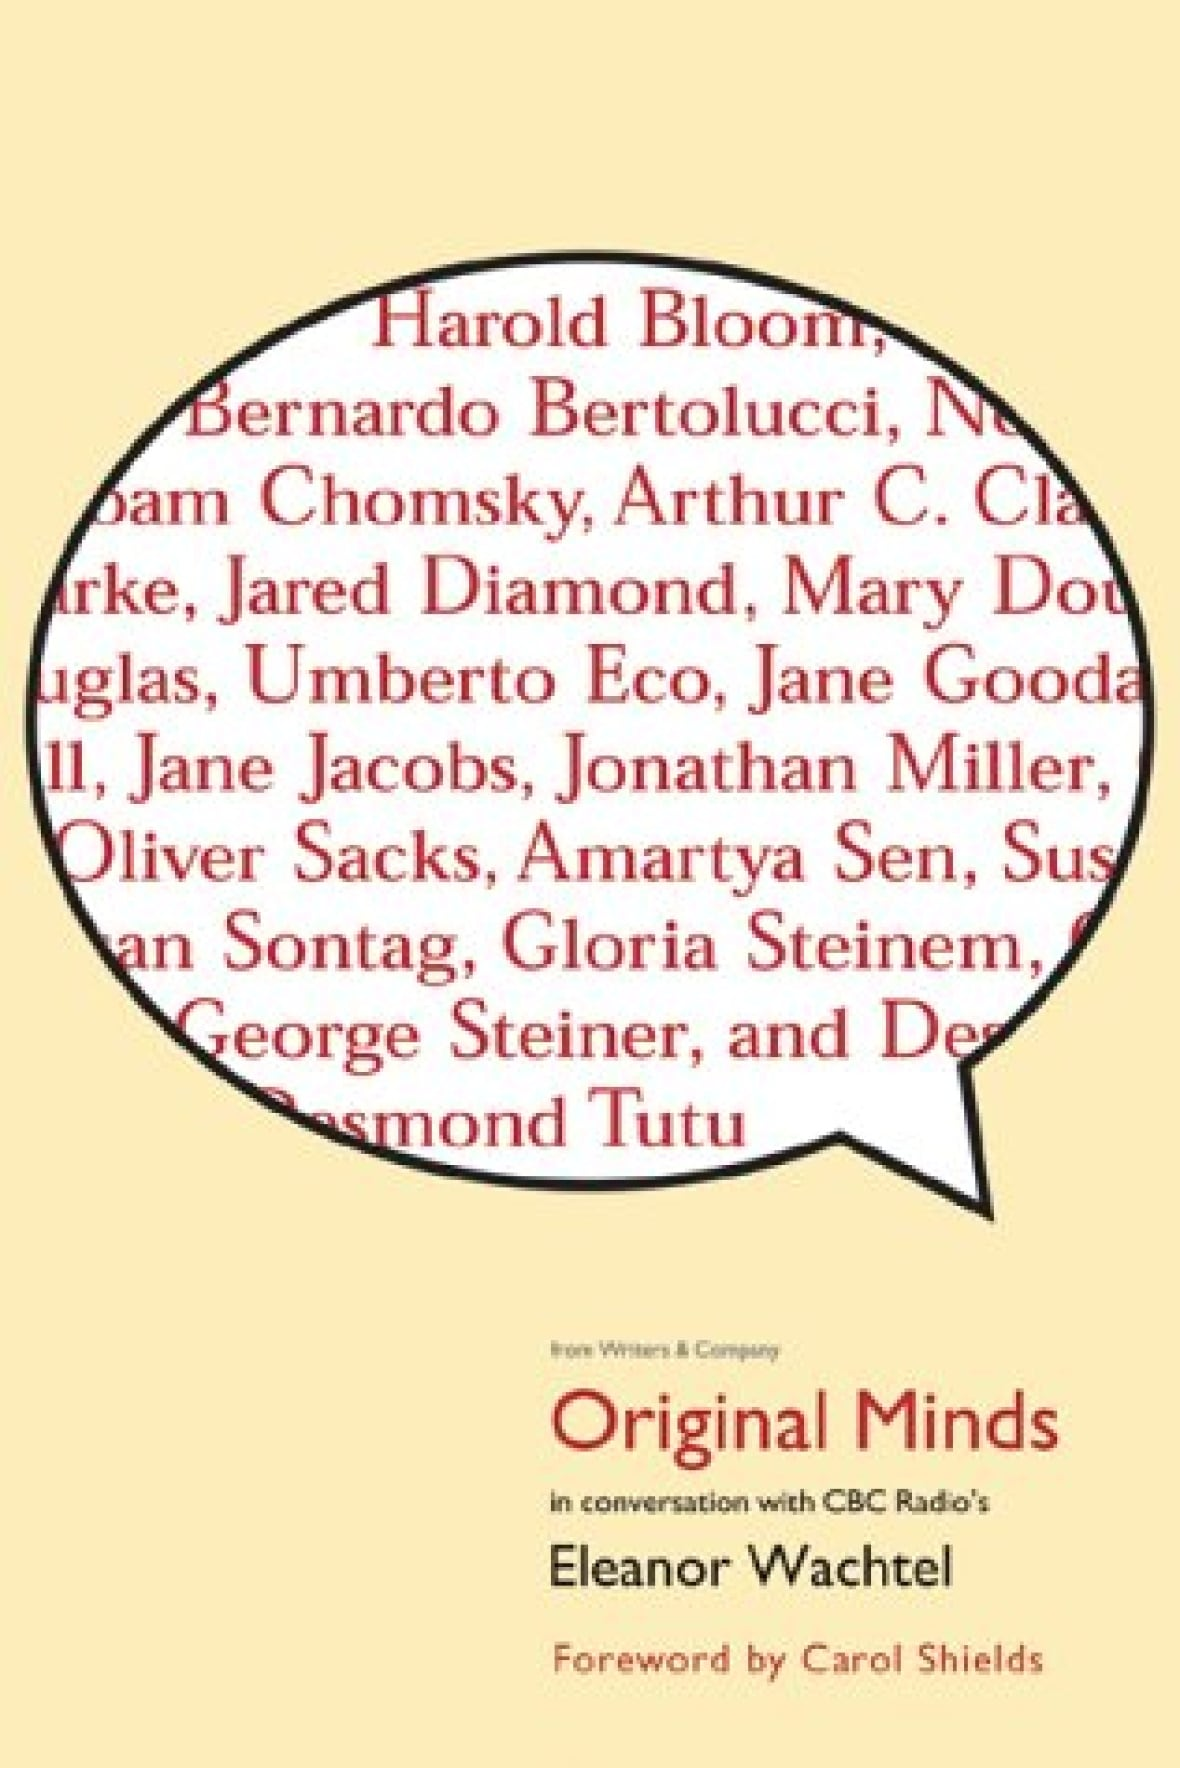 Original Minds